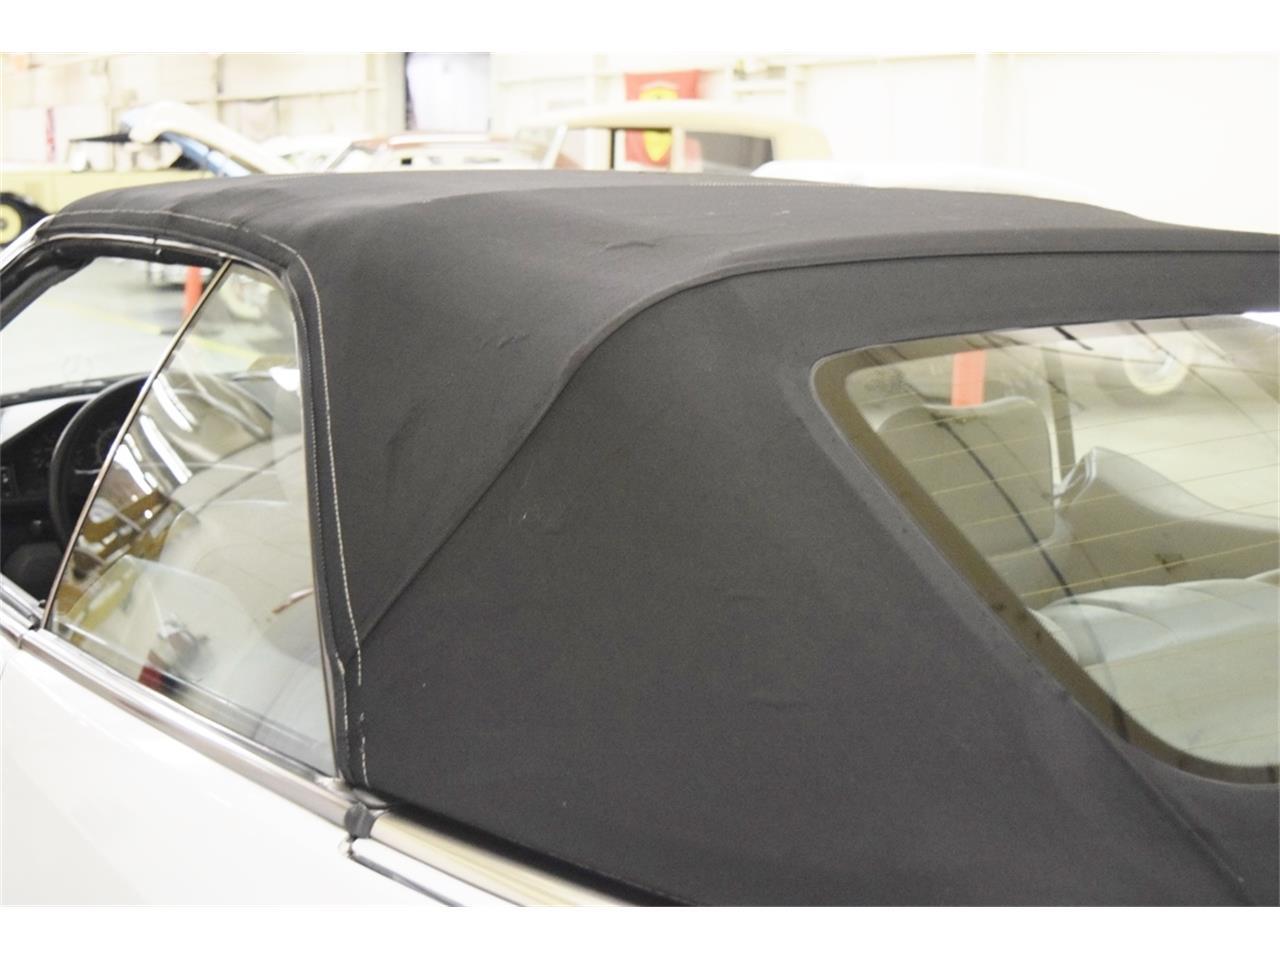 Large Picture of 1993 Mercedes-Benz 300CE located in Fredericksburg Virginia - $15,900.00 - ONU8